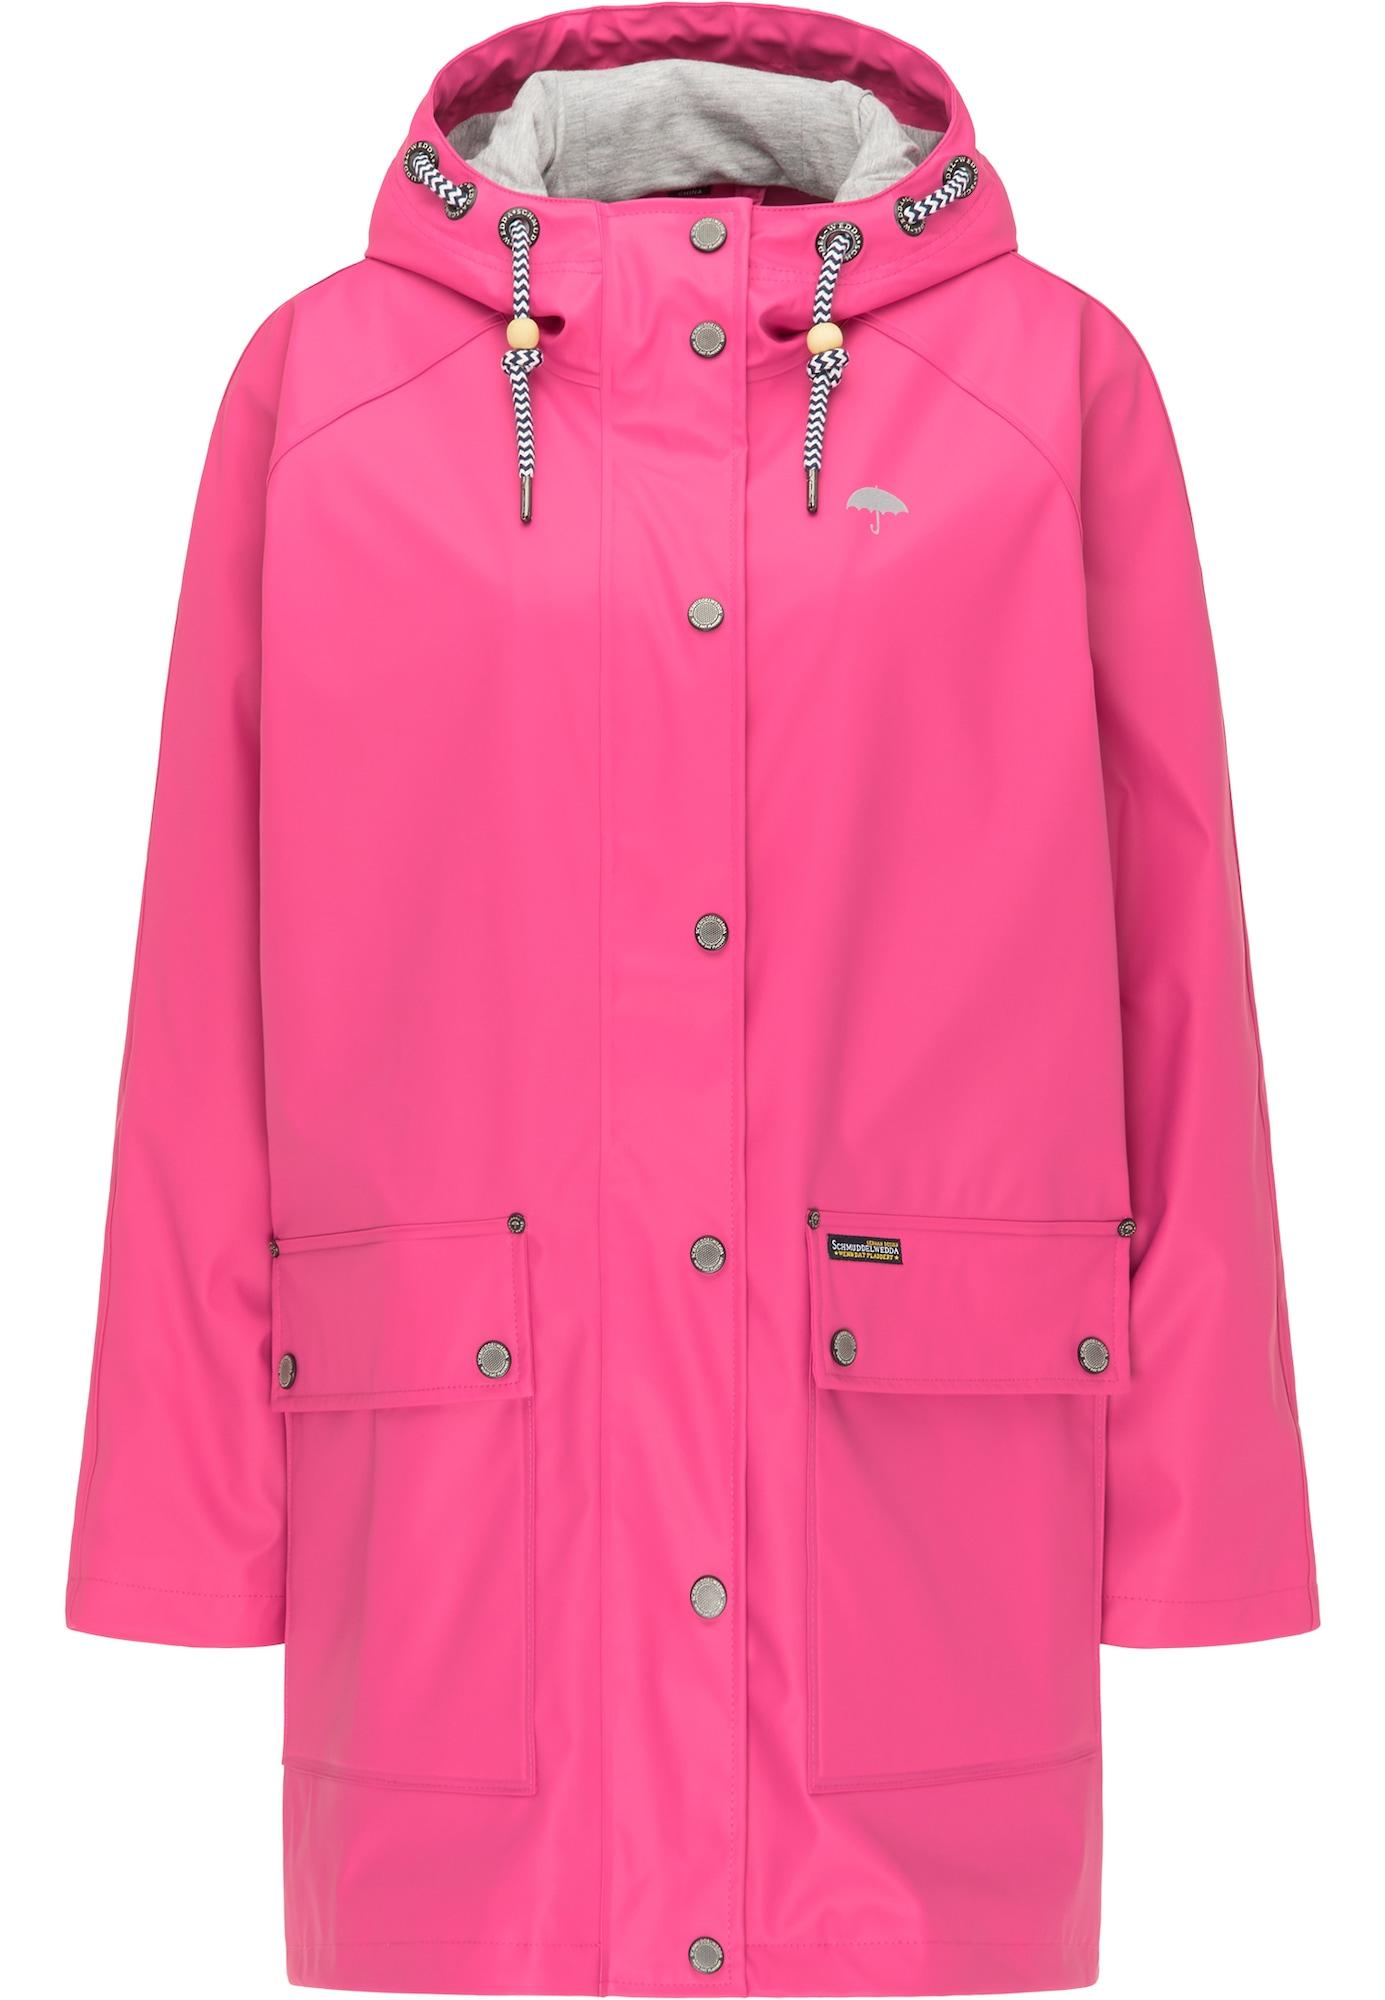 Schmuddelwedda Demisezoninis paltas rožinė